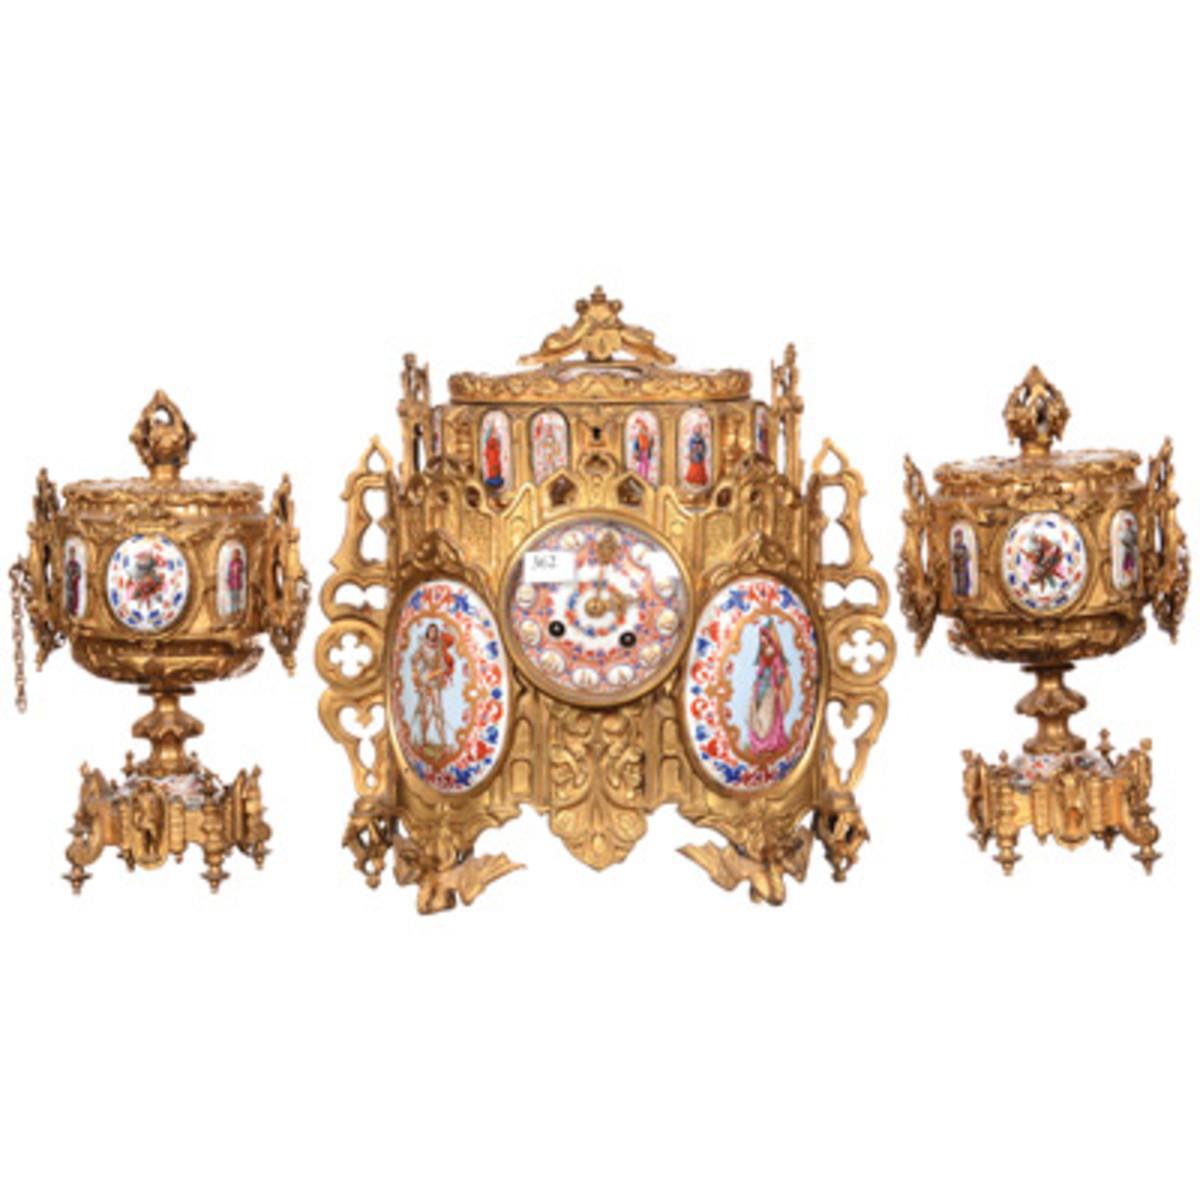 decorative arts: Sevres ormolu clock set